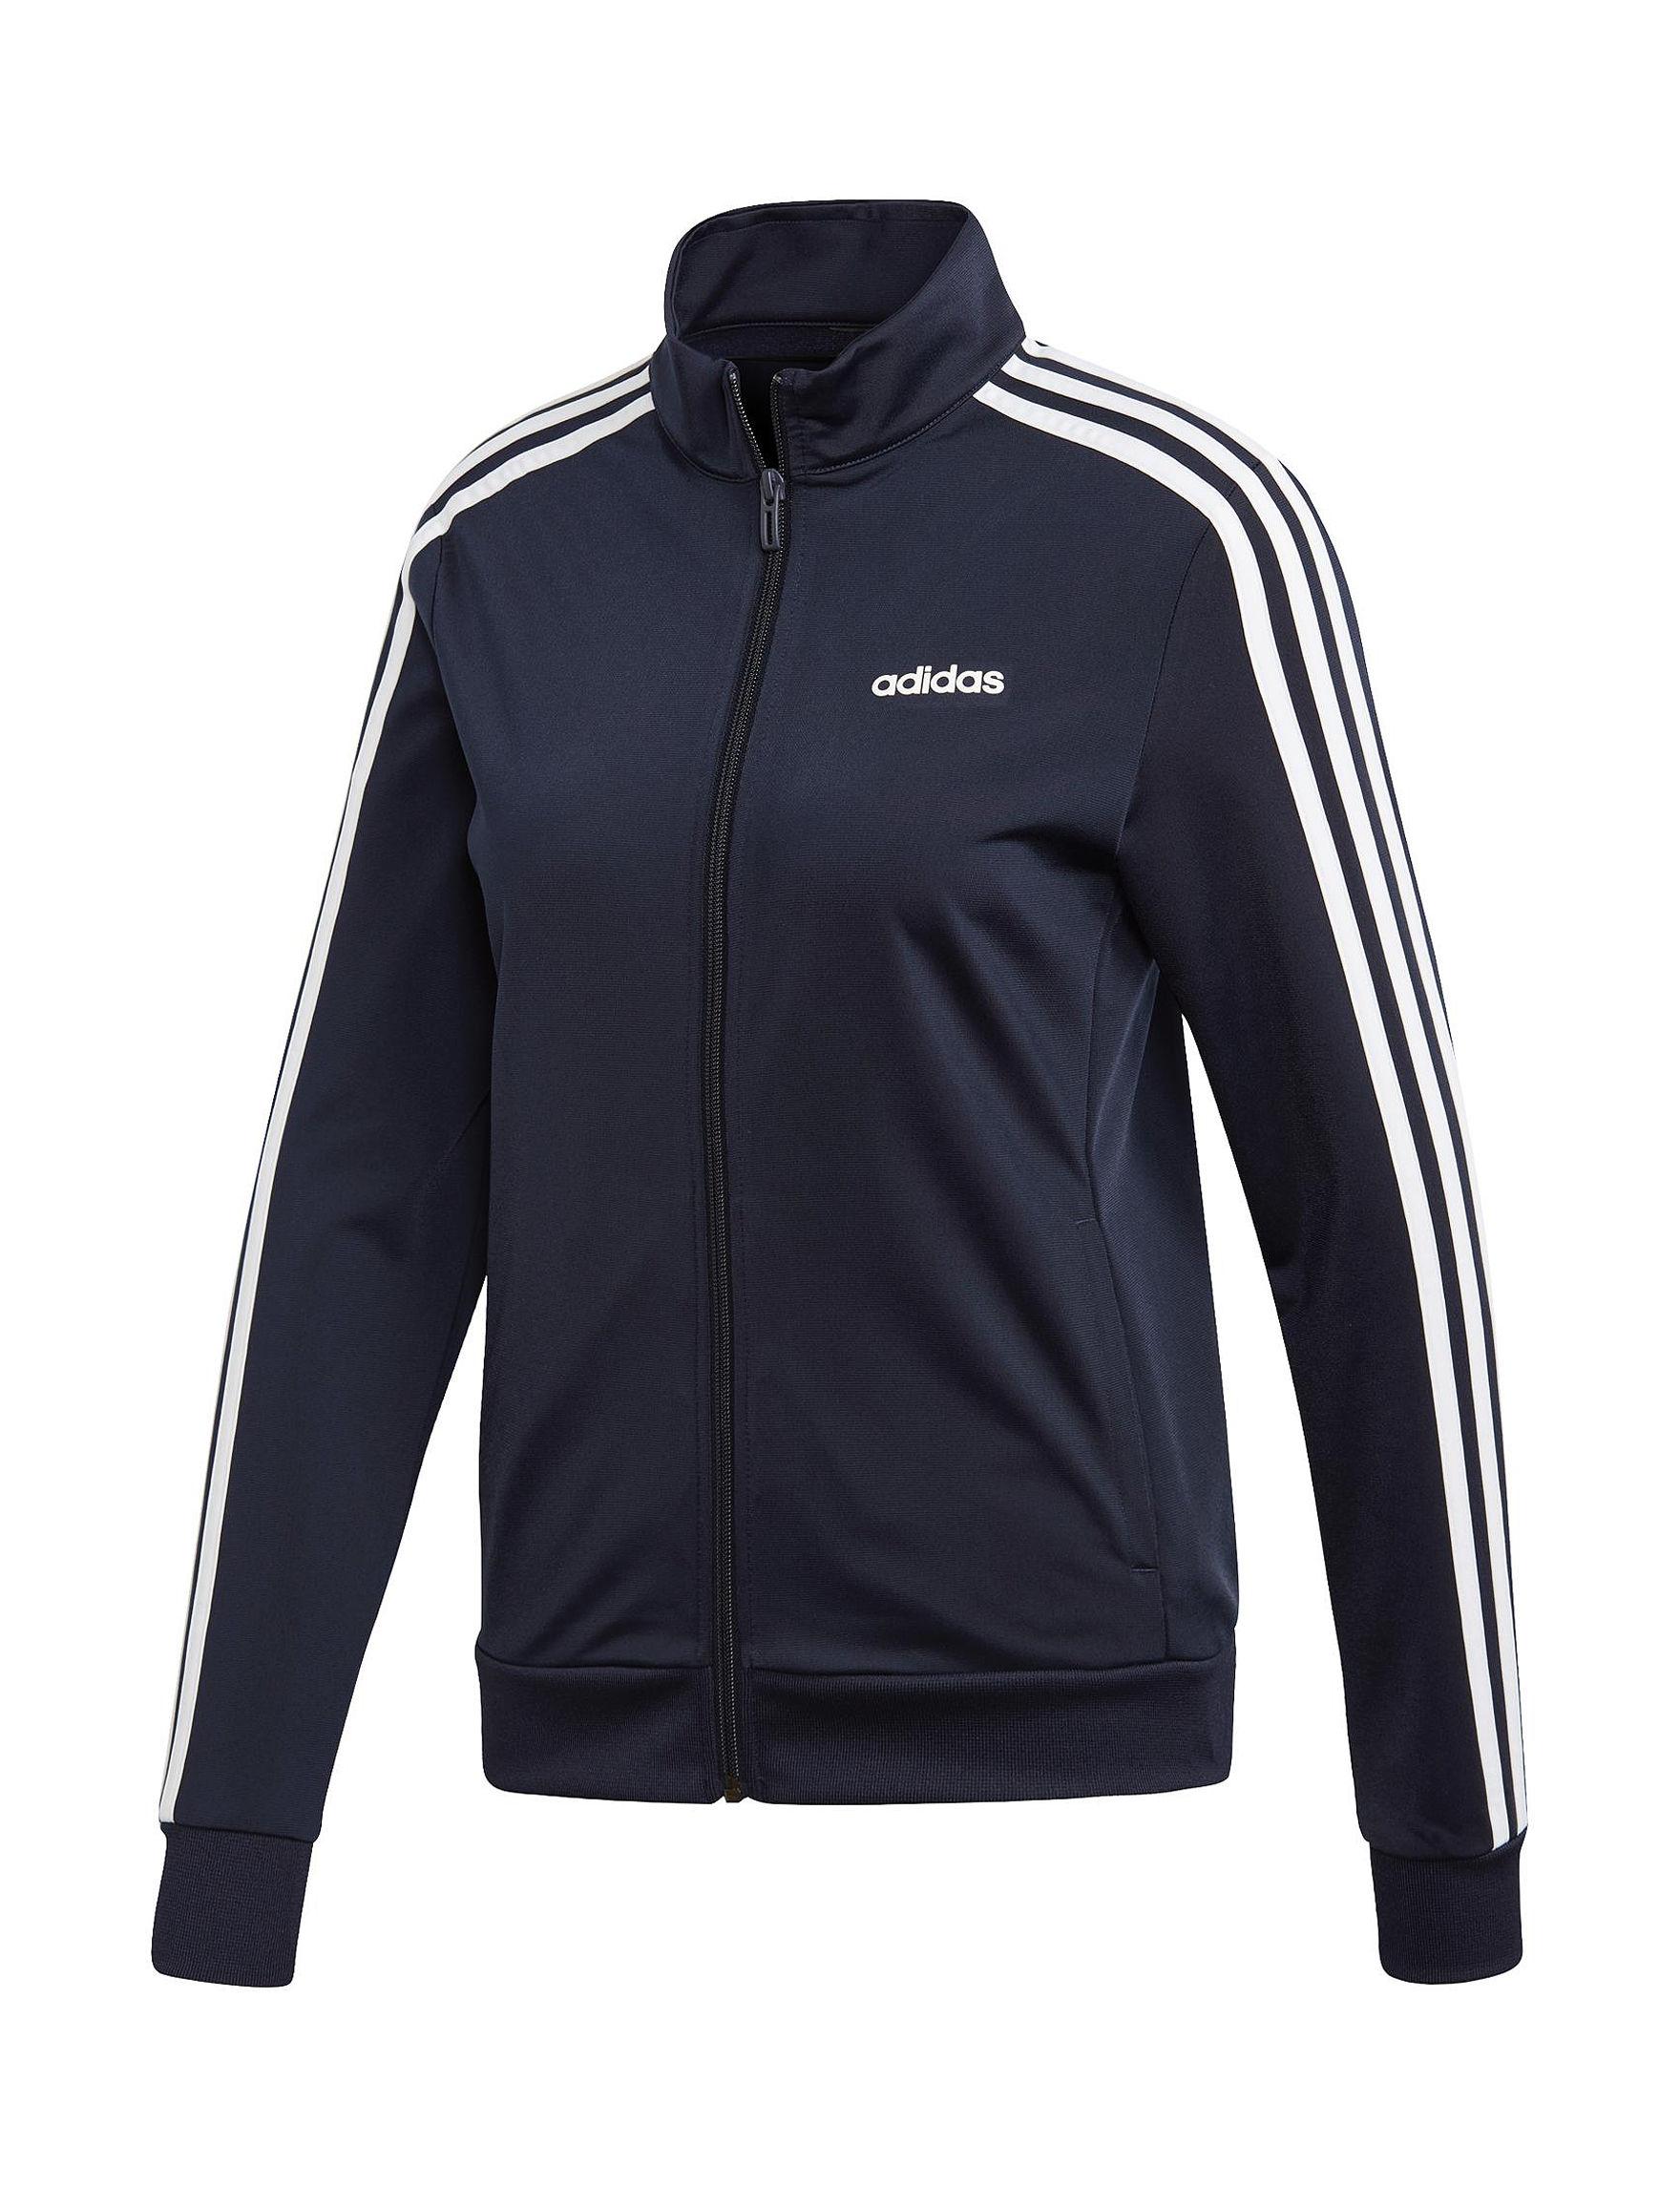 Adidas  Lightweight Jackets & Blazers